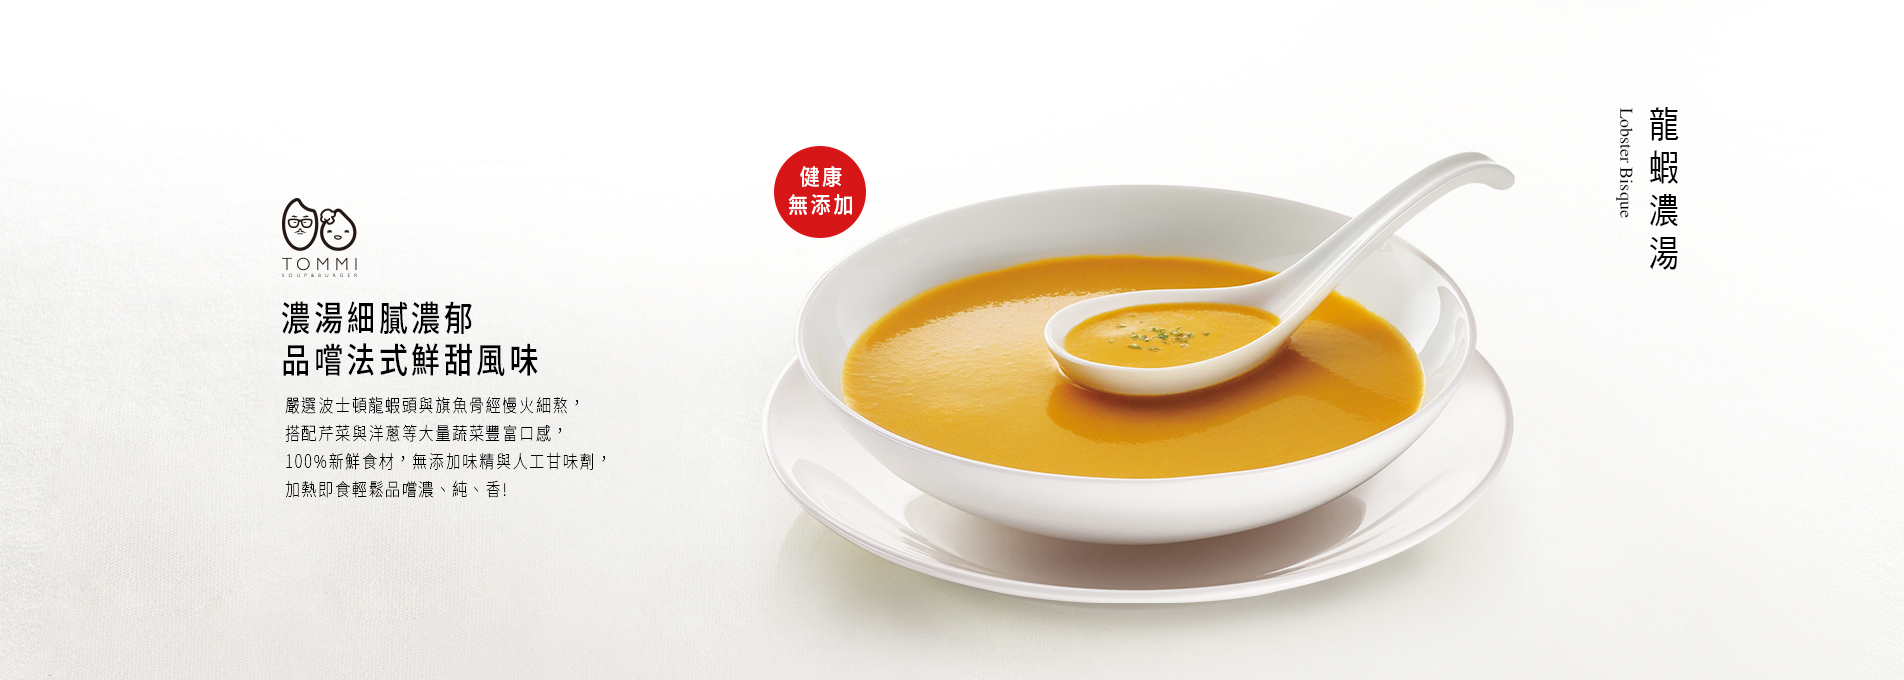 TOMMI湯米 龍蝦濃湯(10入)